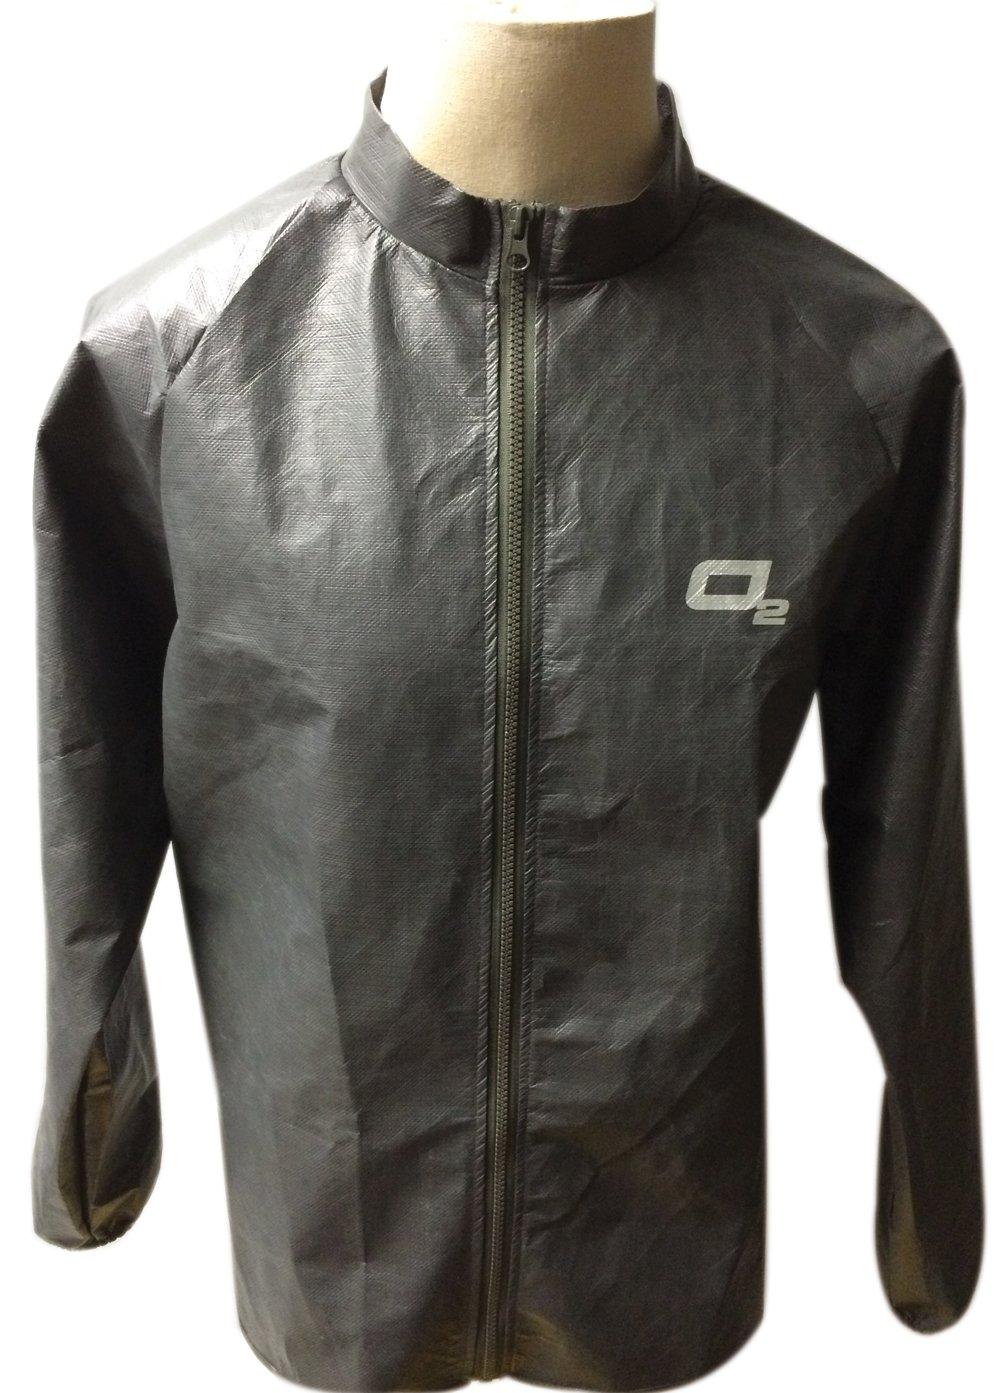 O2 Rainwear Mens Element Series Cycling Jacket